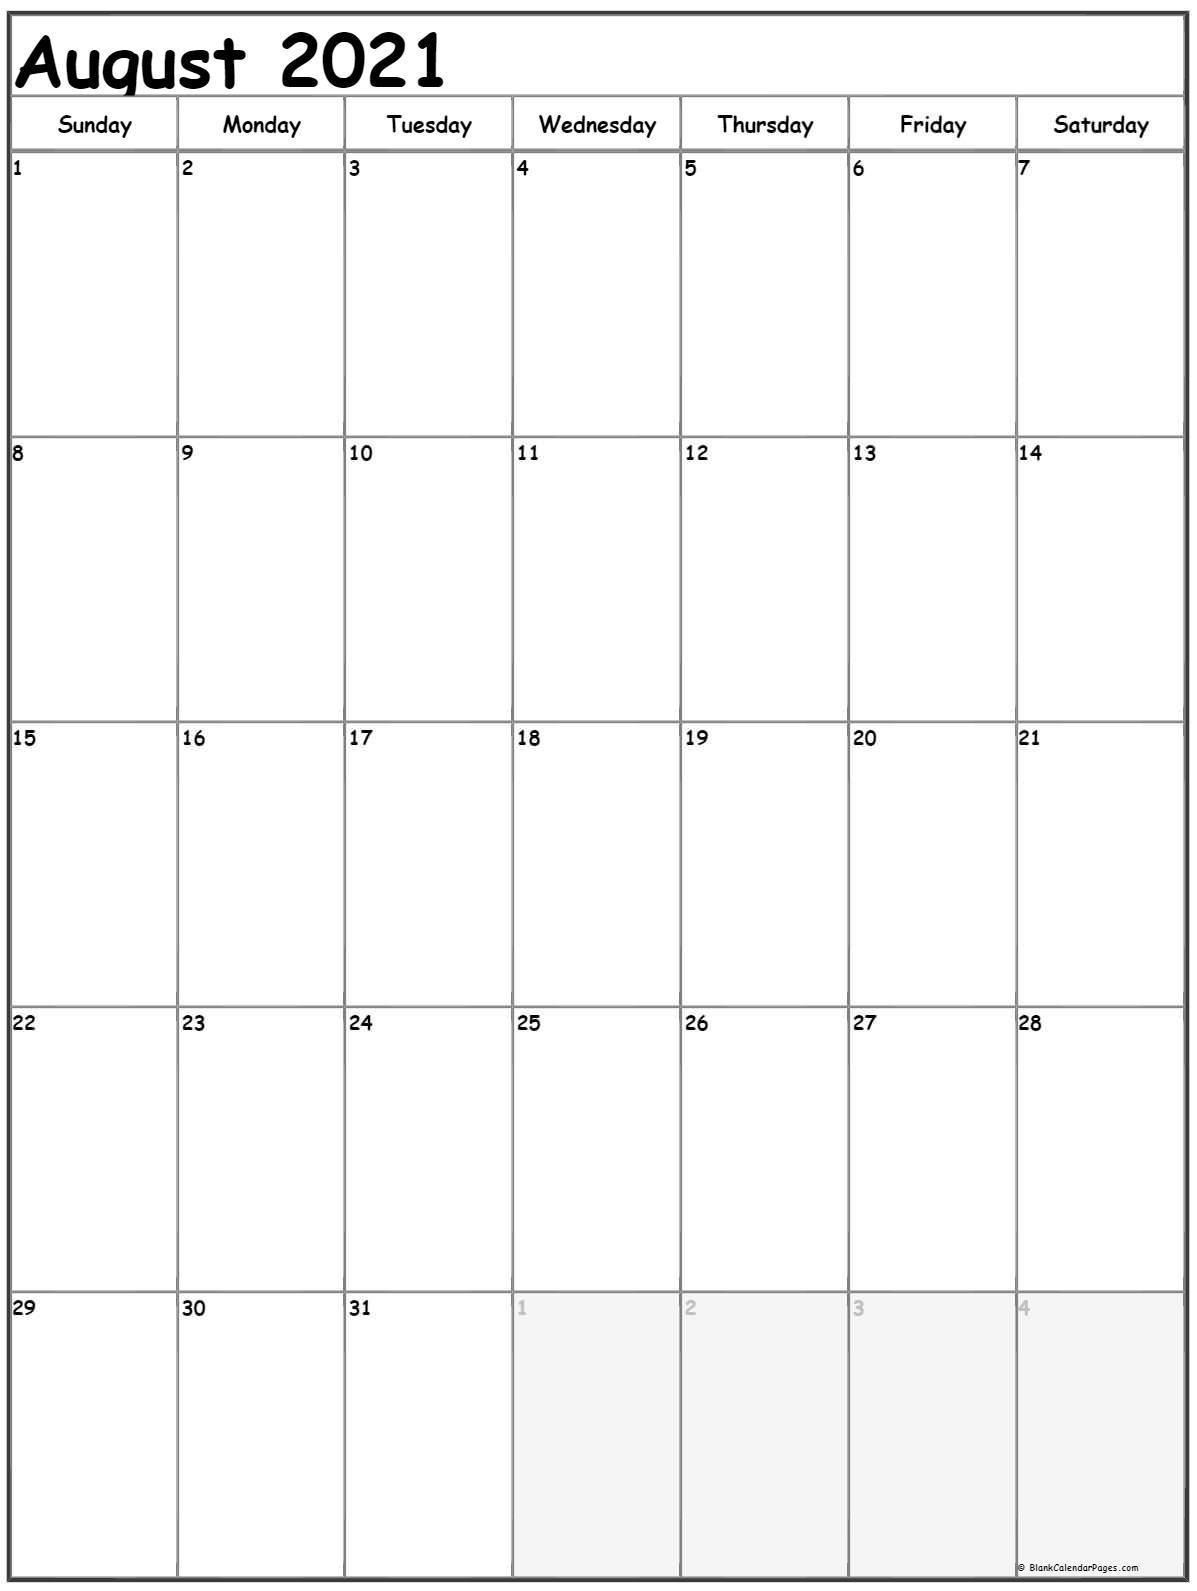 August 2021 Vertical Calendar | Portrait intended for Free Calendars 2021 Word Doc Printable August